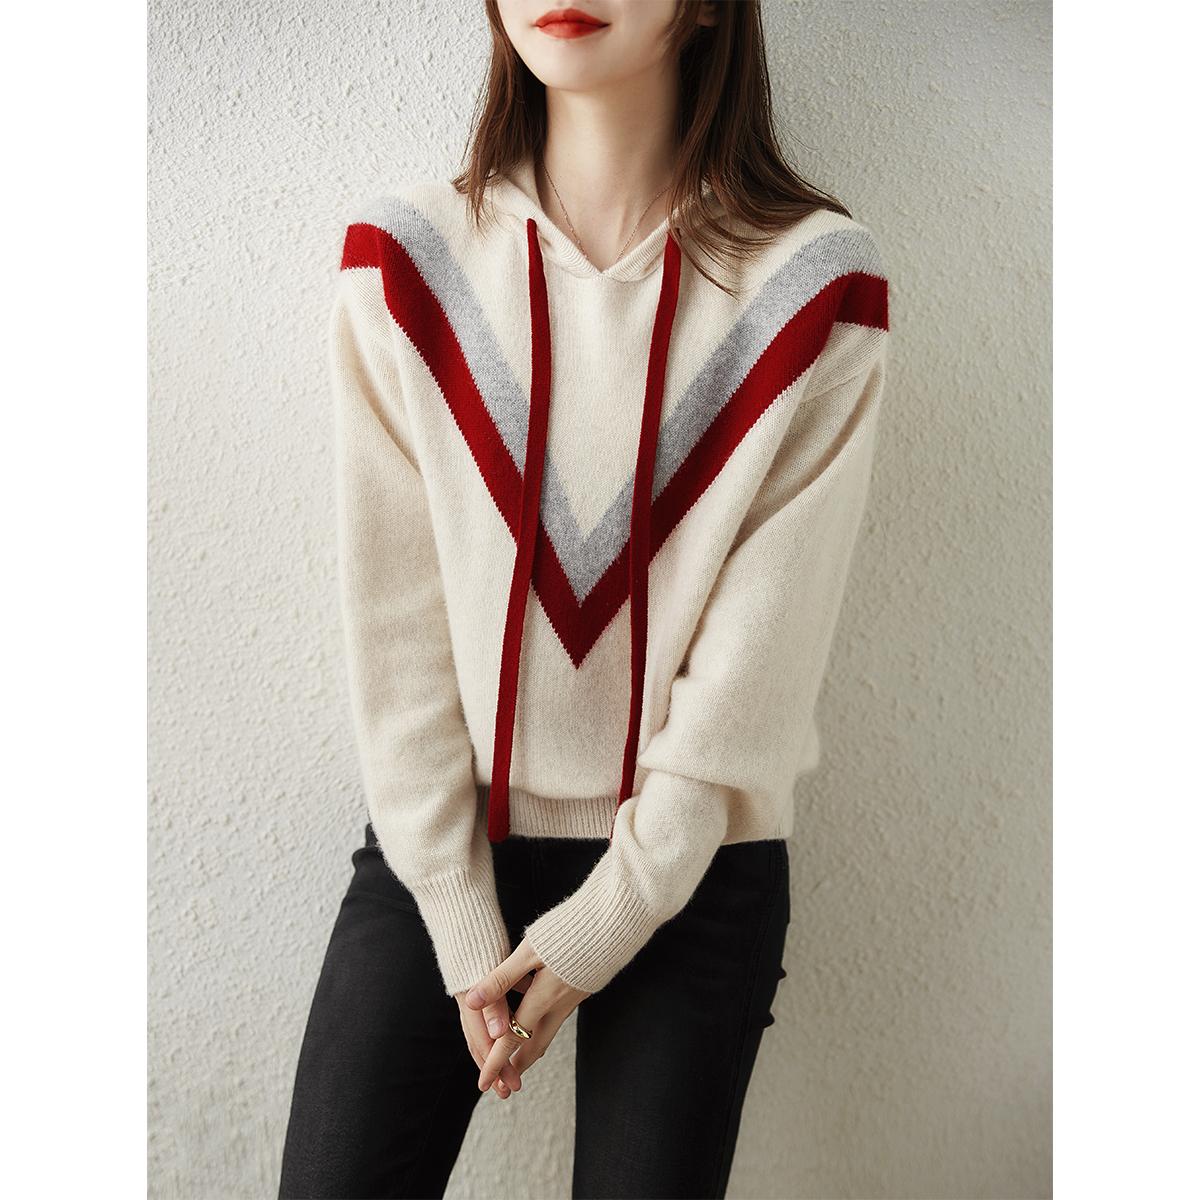 [ZY258435AG]笑涵閣穿不膩的肉感純羊絨V型幾何連帽針織衫衛衣